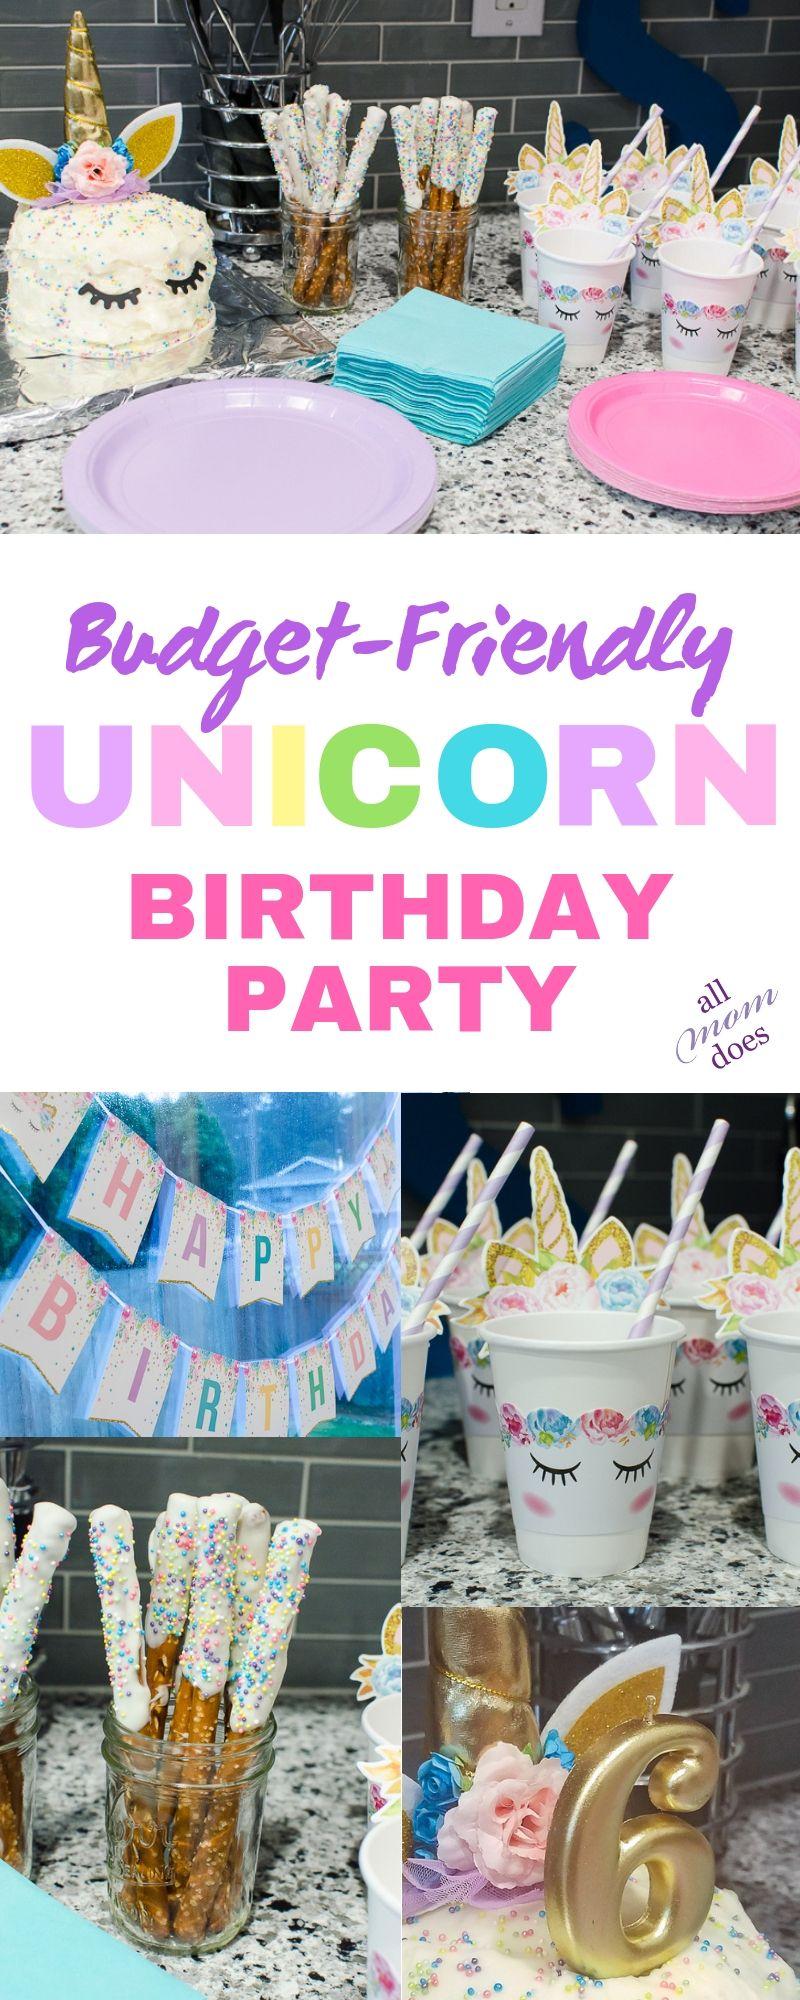 Budget Friendly Unicorn Birthday Party Unicorn Birthday Party